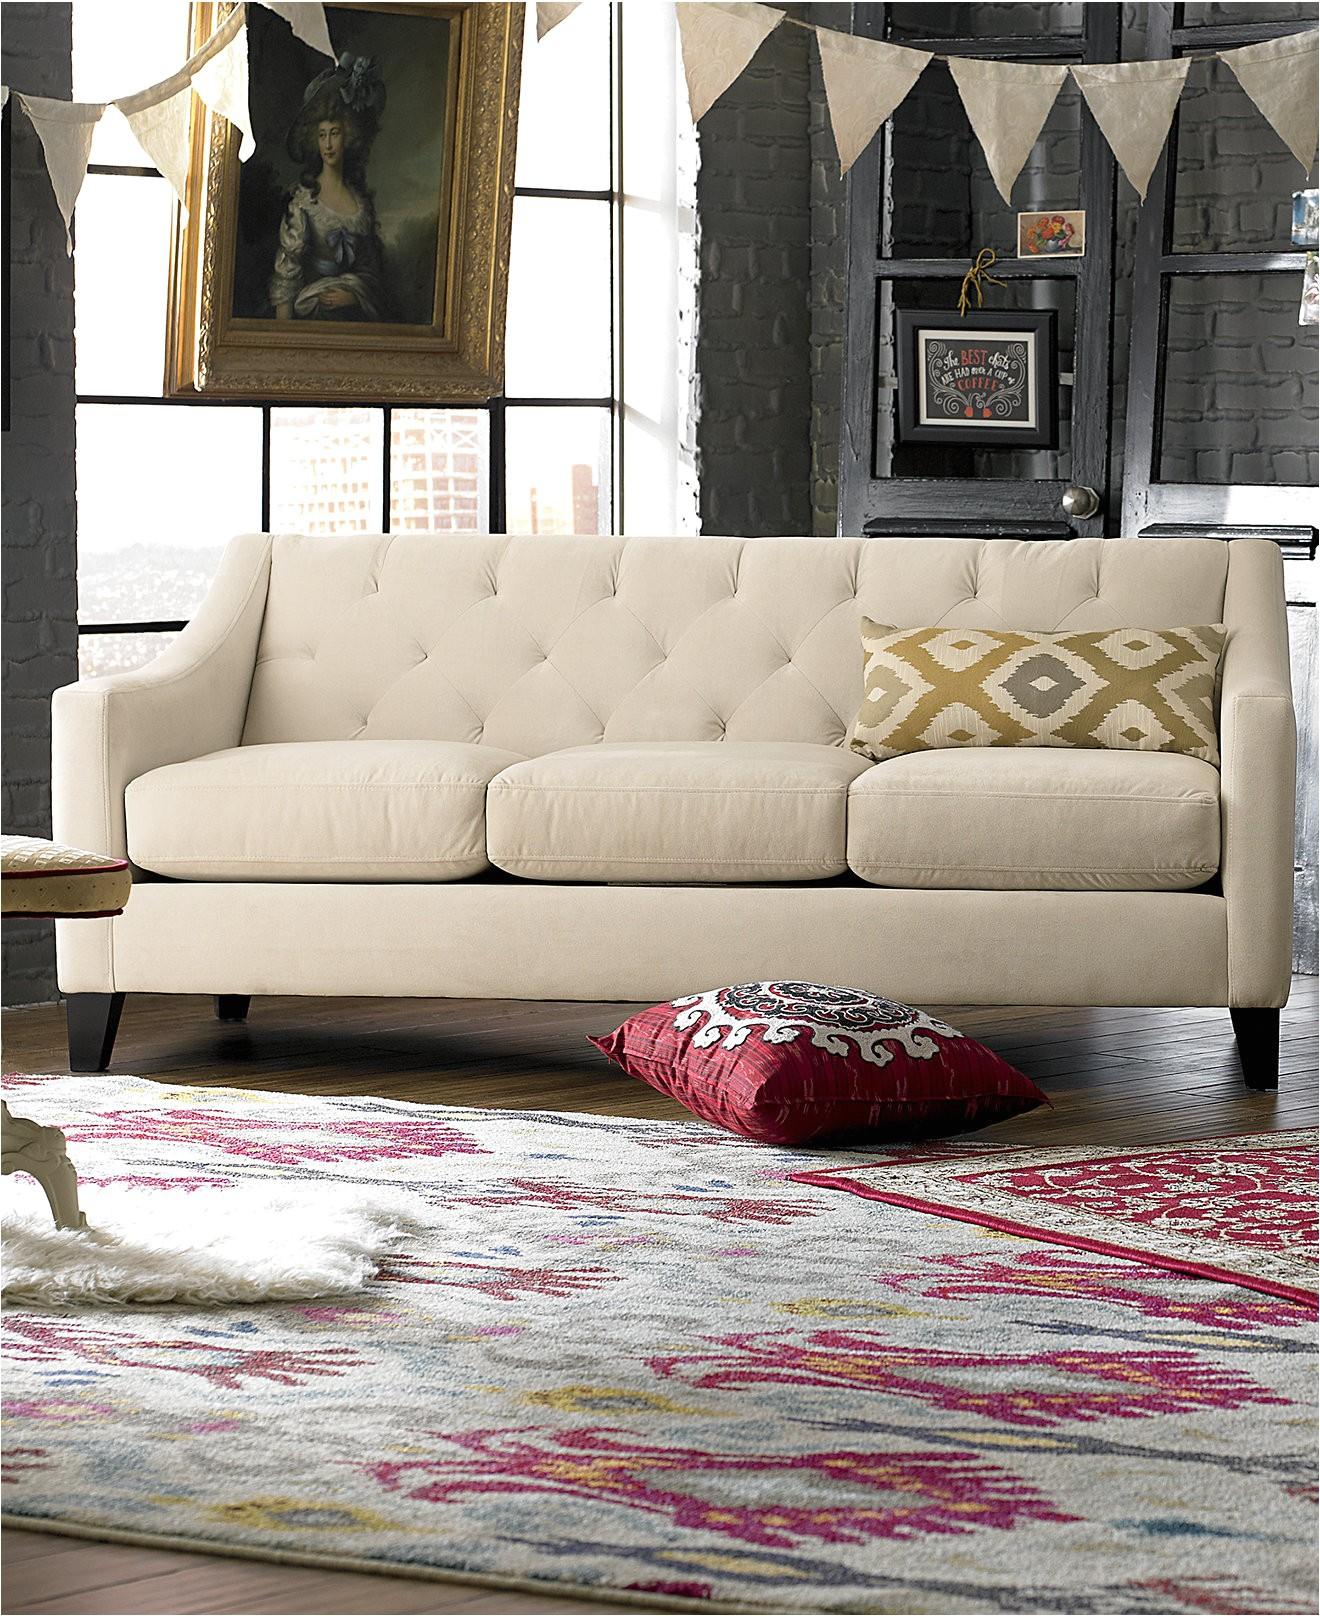 Attractive Macys Chloe Tufted Sofa Exceptional Macys Living Room Chairs With Chloe  Velvet Tufted Sofa Photo